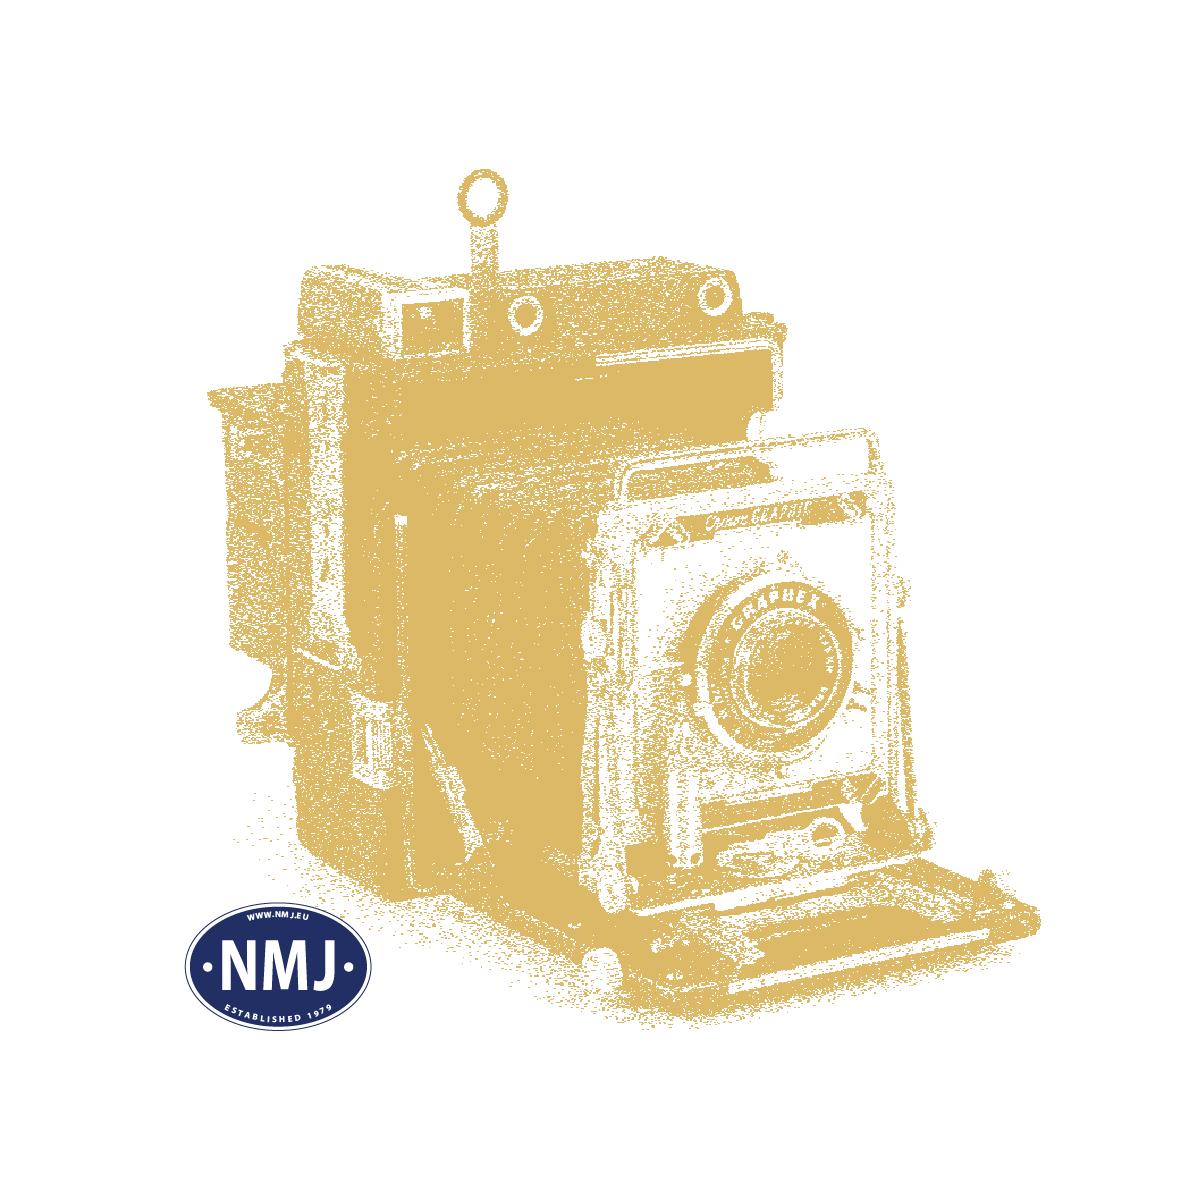 "NMJT90004 - NMJ Topline NSB Di3a.621 ""Nohab"", DC"